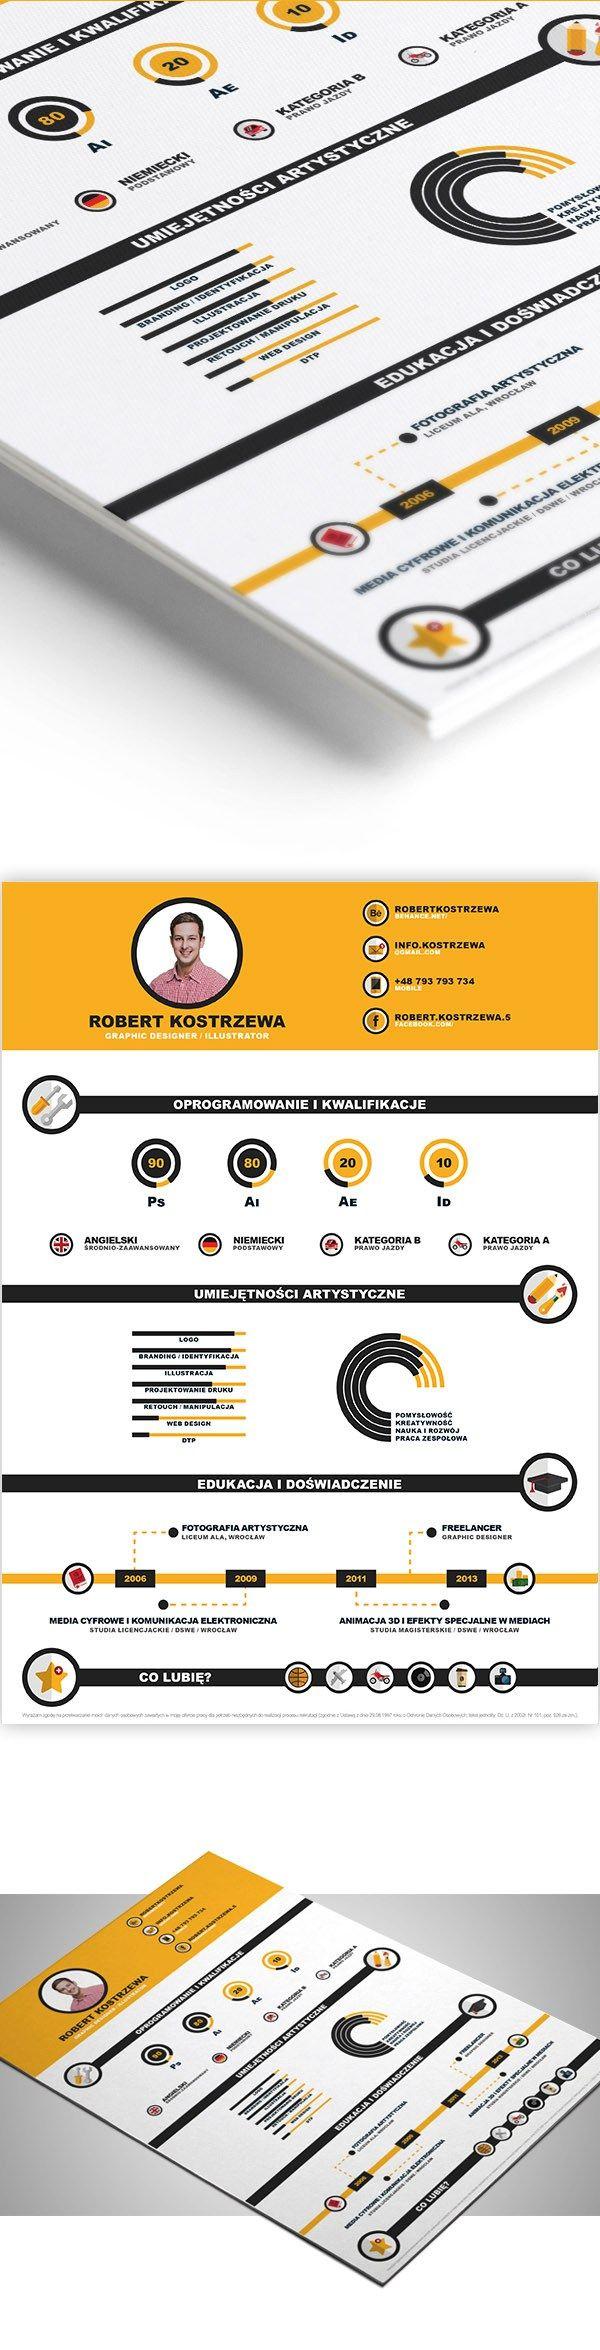 Free Infographic Cv/Resume #CV #Resume #PSD #Templates